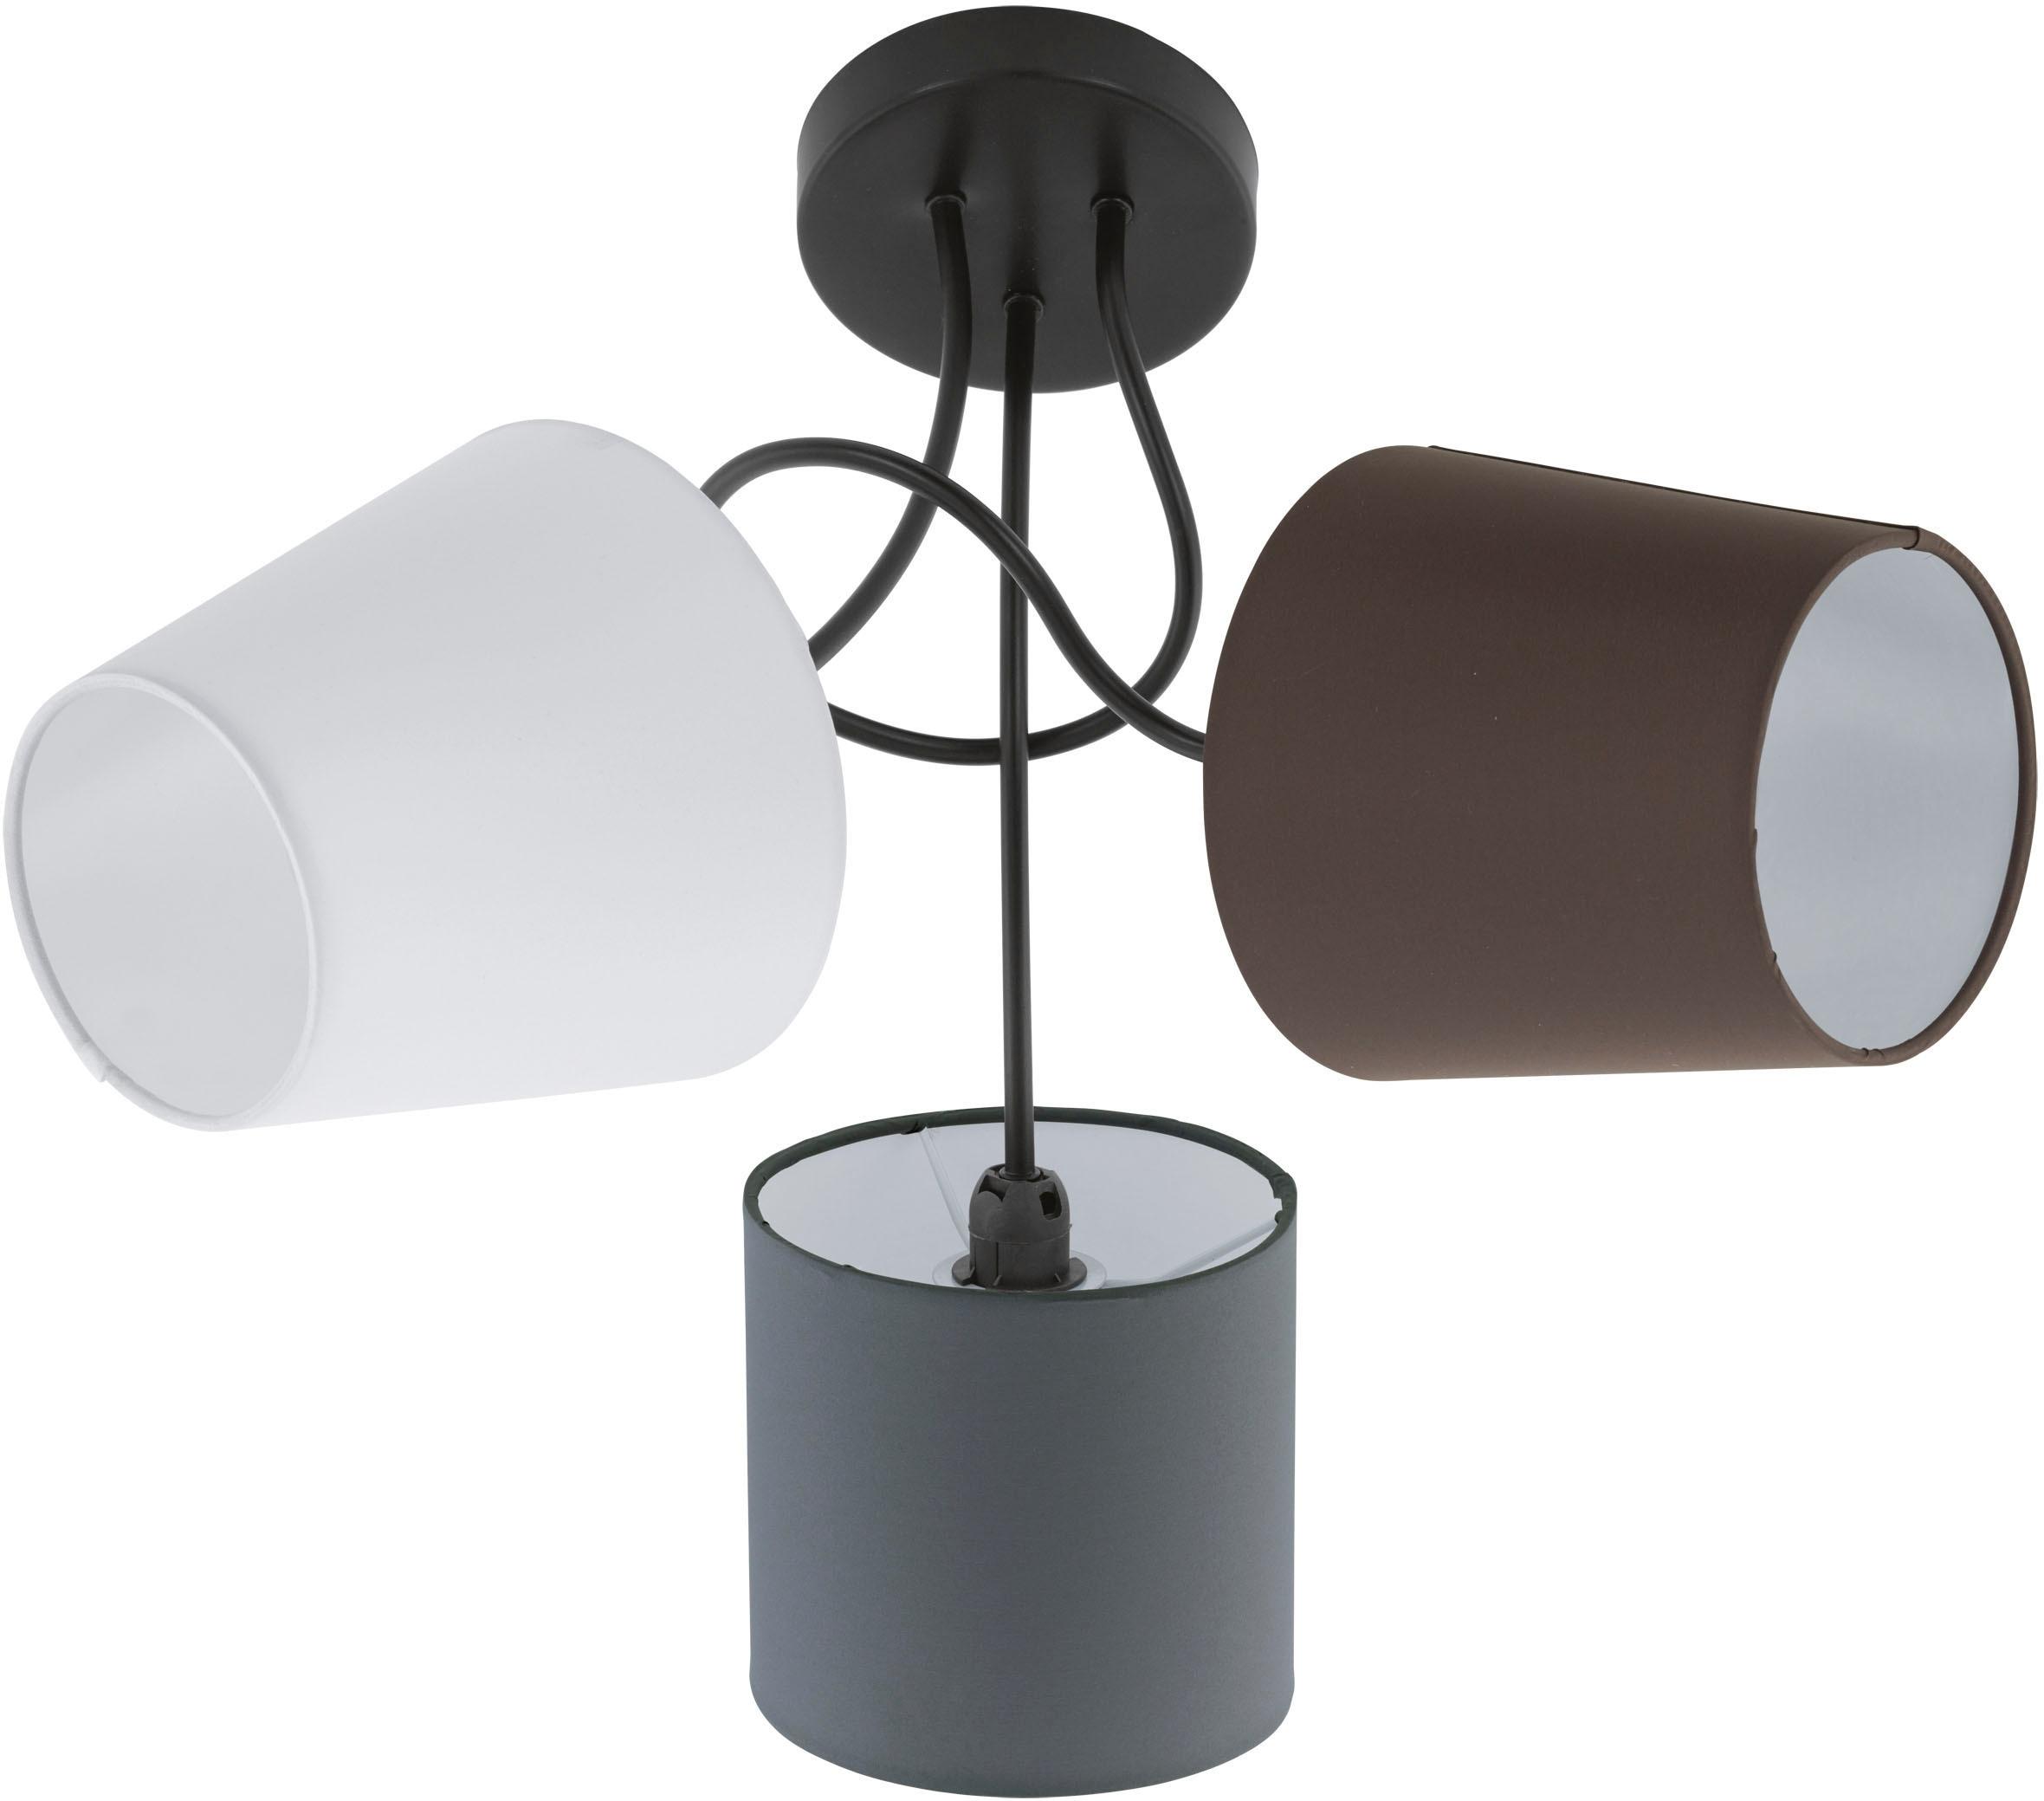 EGLO Deckenleuchte ALMEIDA, E14, Deckenlampe